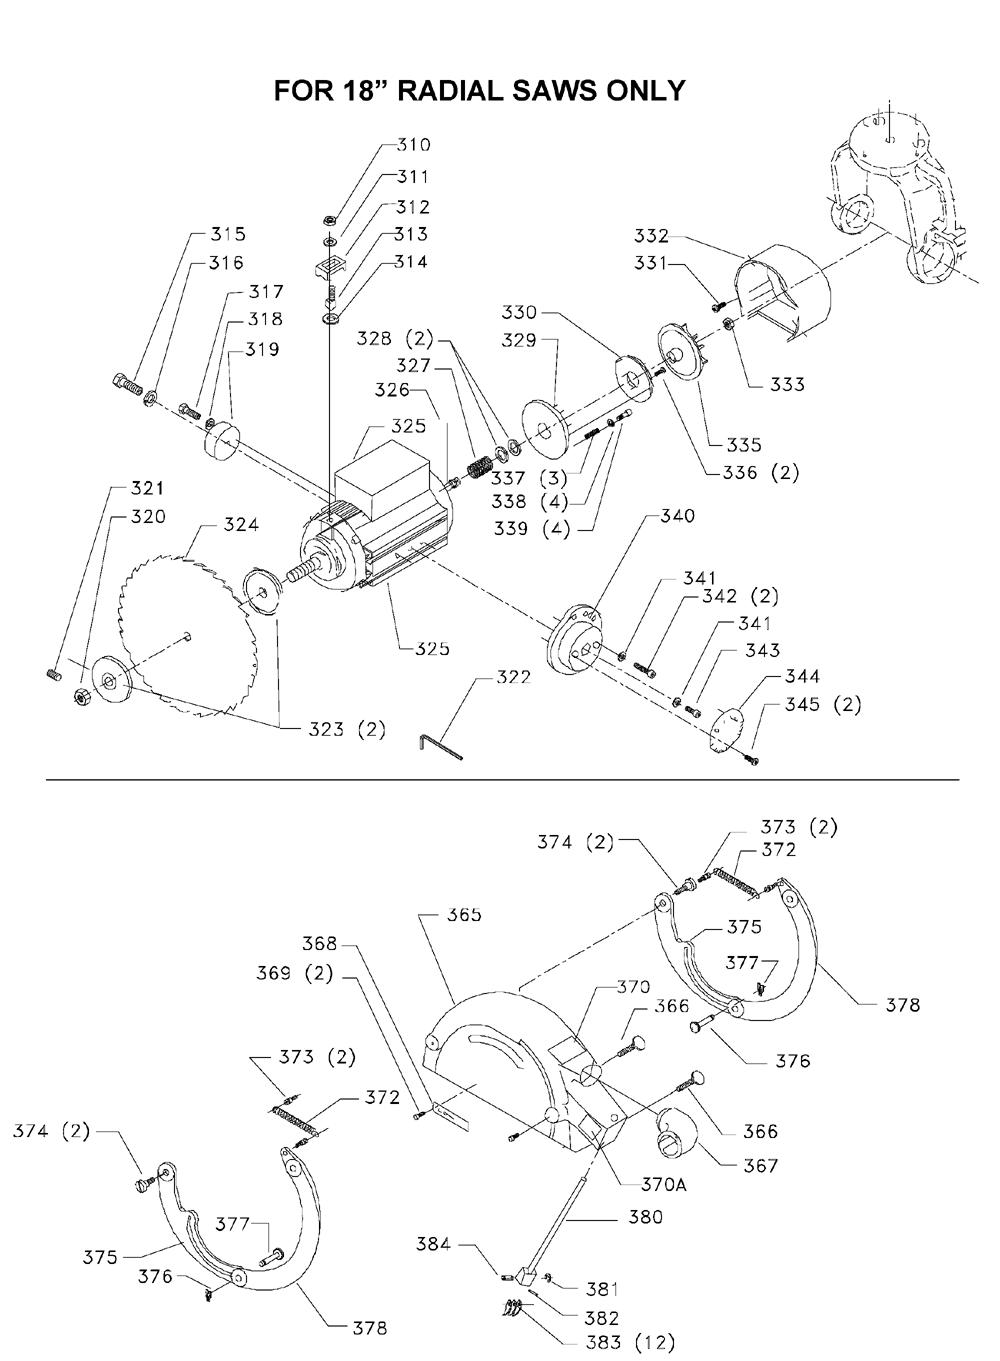 Delta-33-421-Type-1-Parts-1968-PBBreak Down